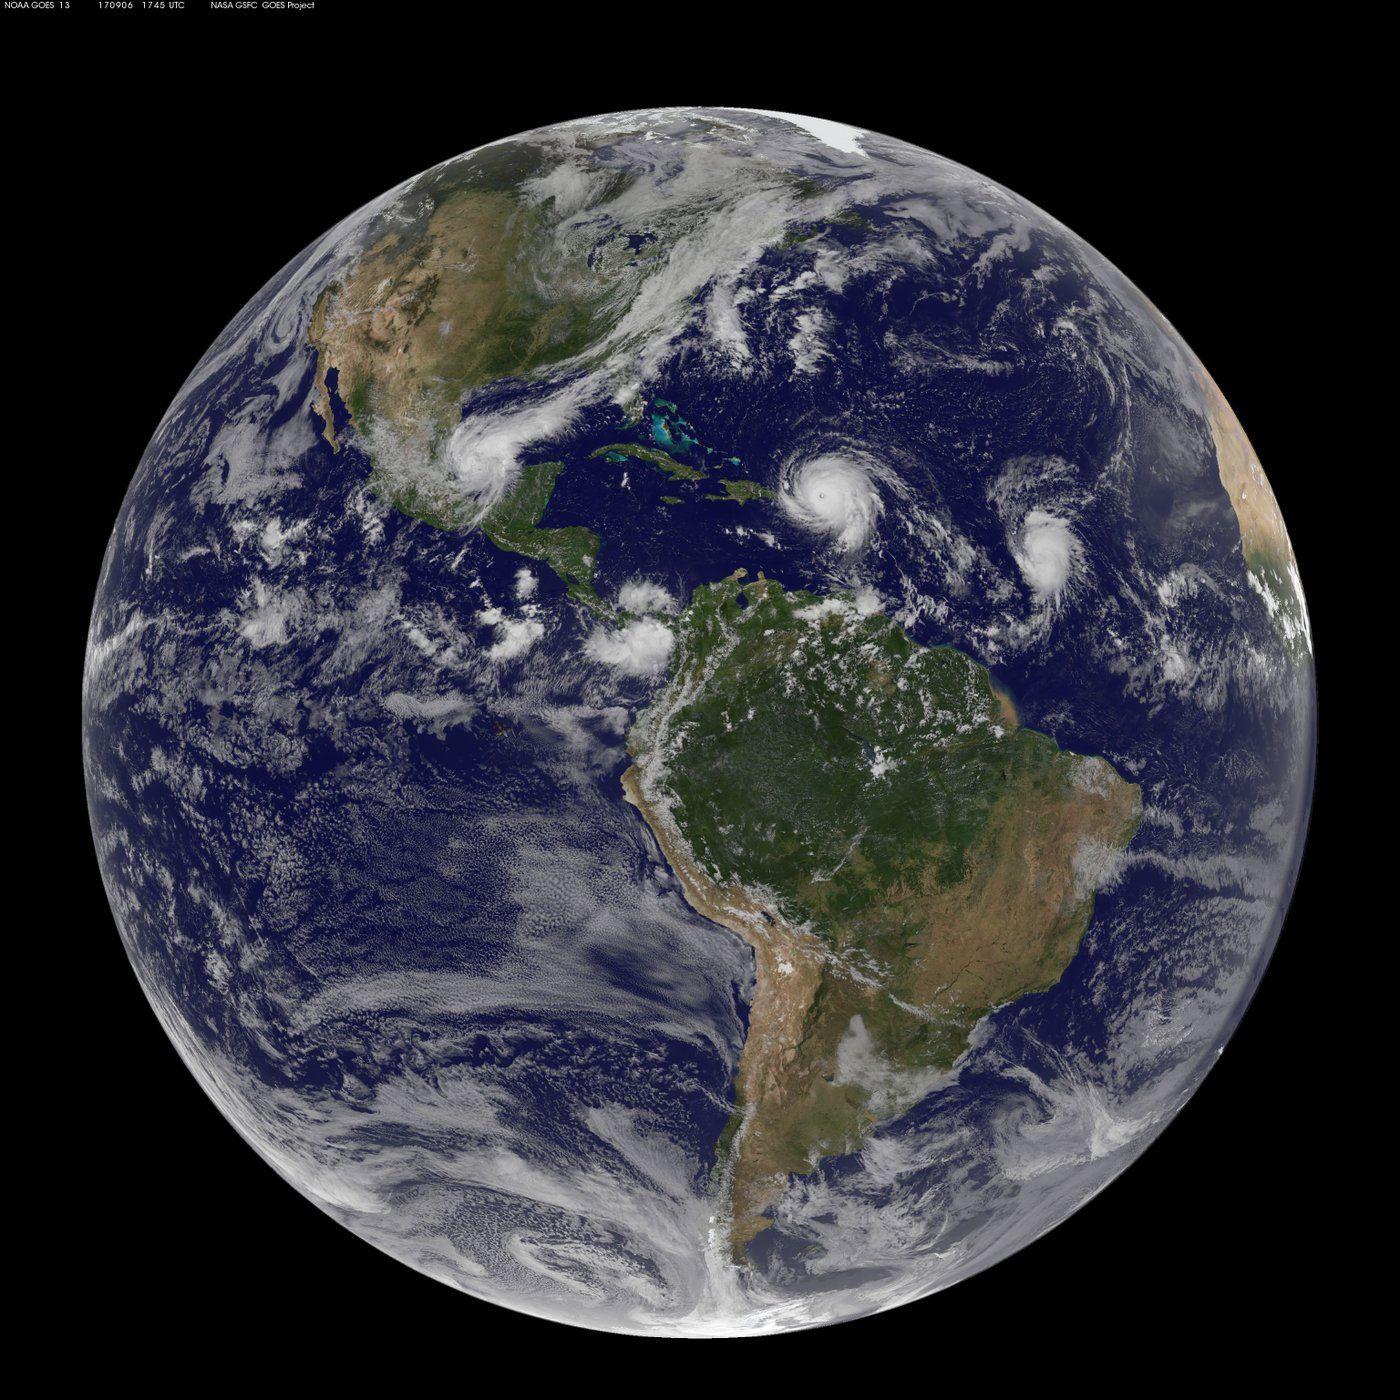 Hurricane Irma In Photos Space Views Of A Monster Storm Space Photos Weather Satellite Atmospheric Phenomenon